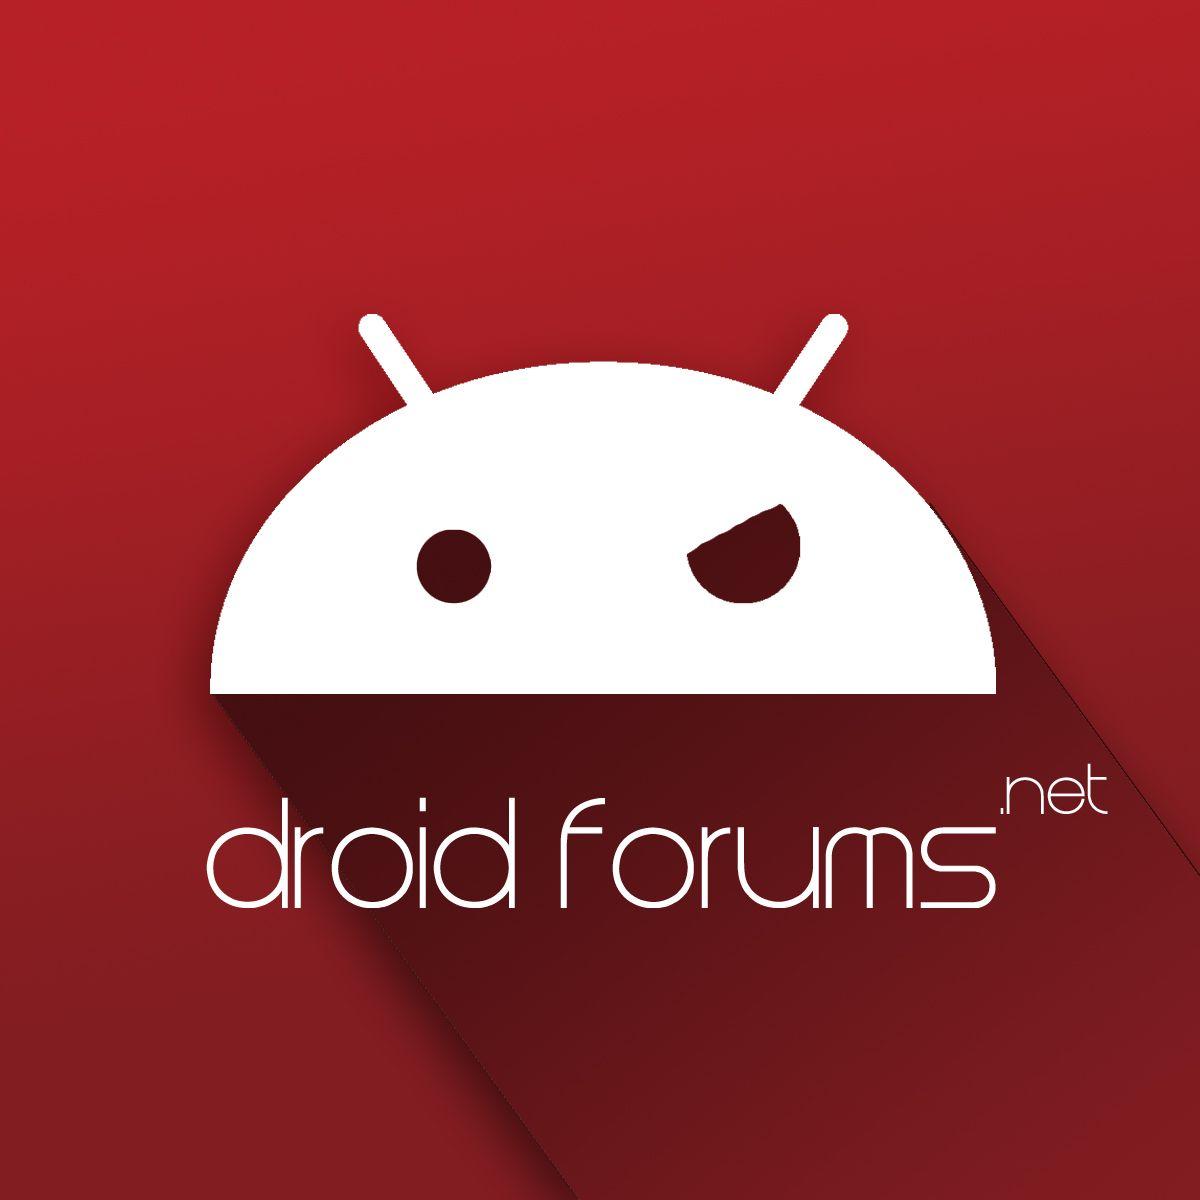 droid forums .net.jpg